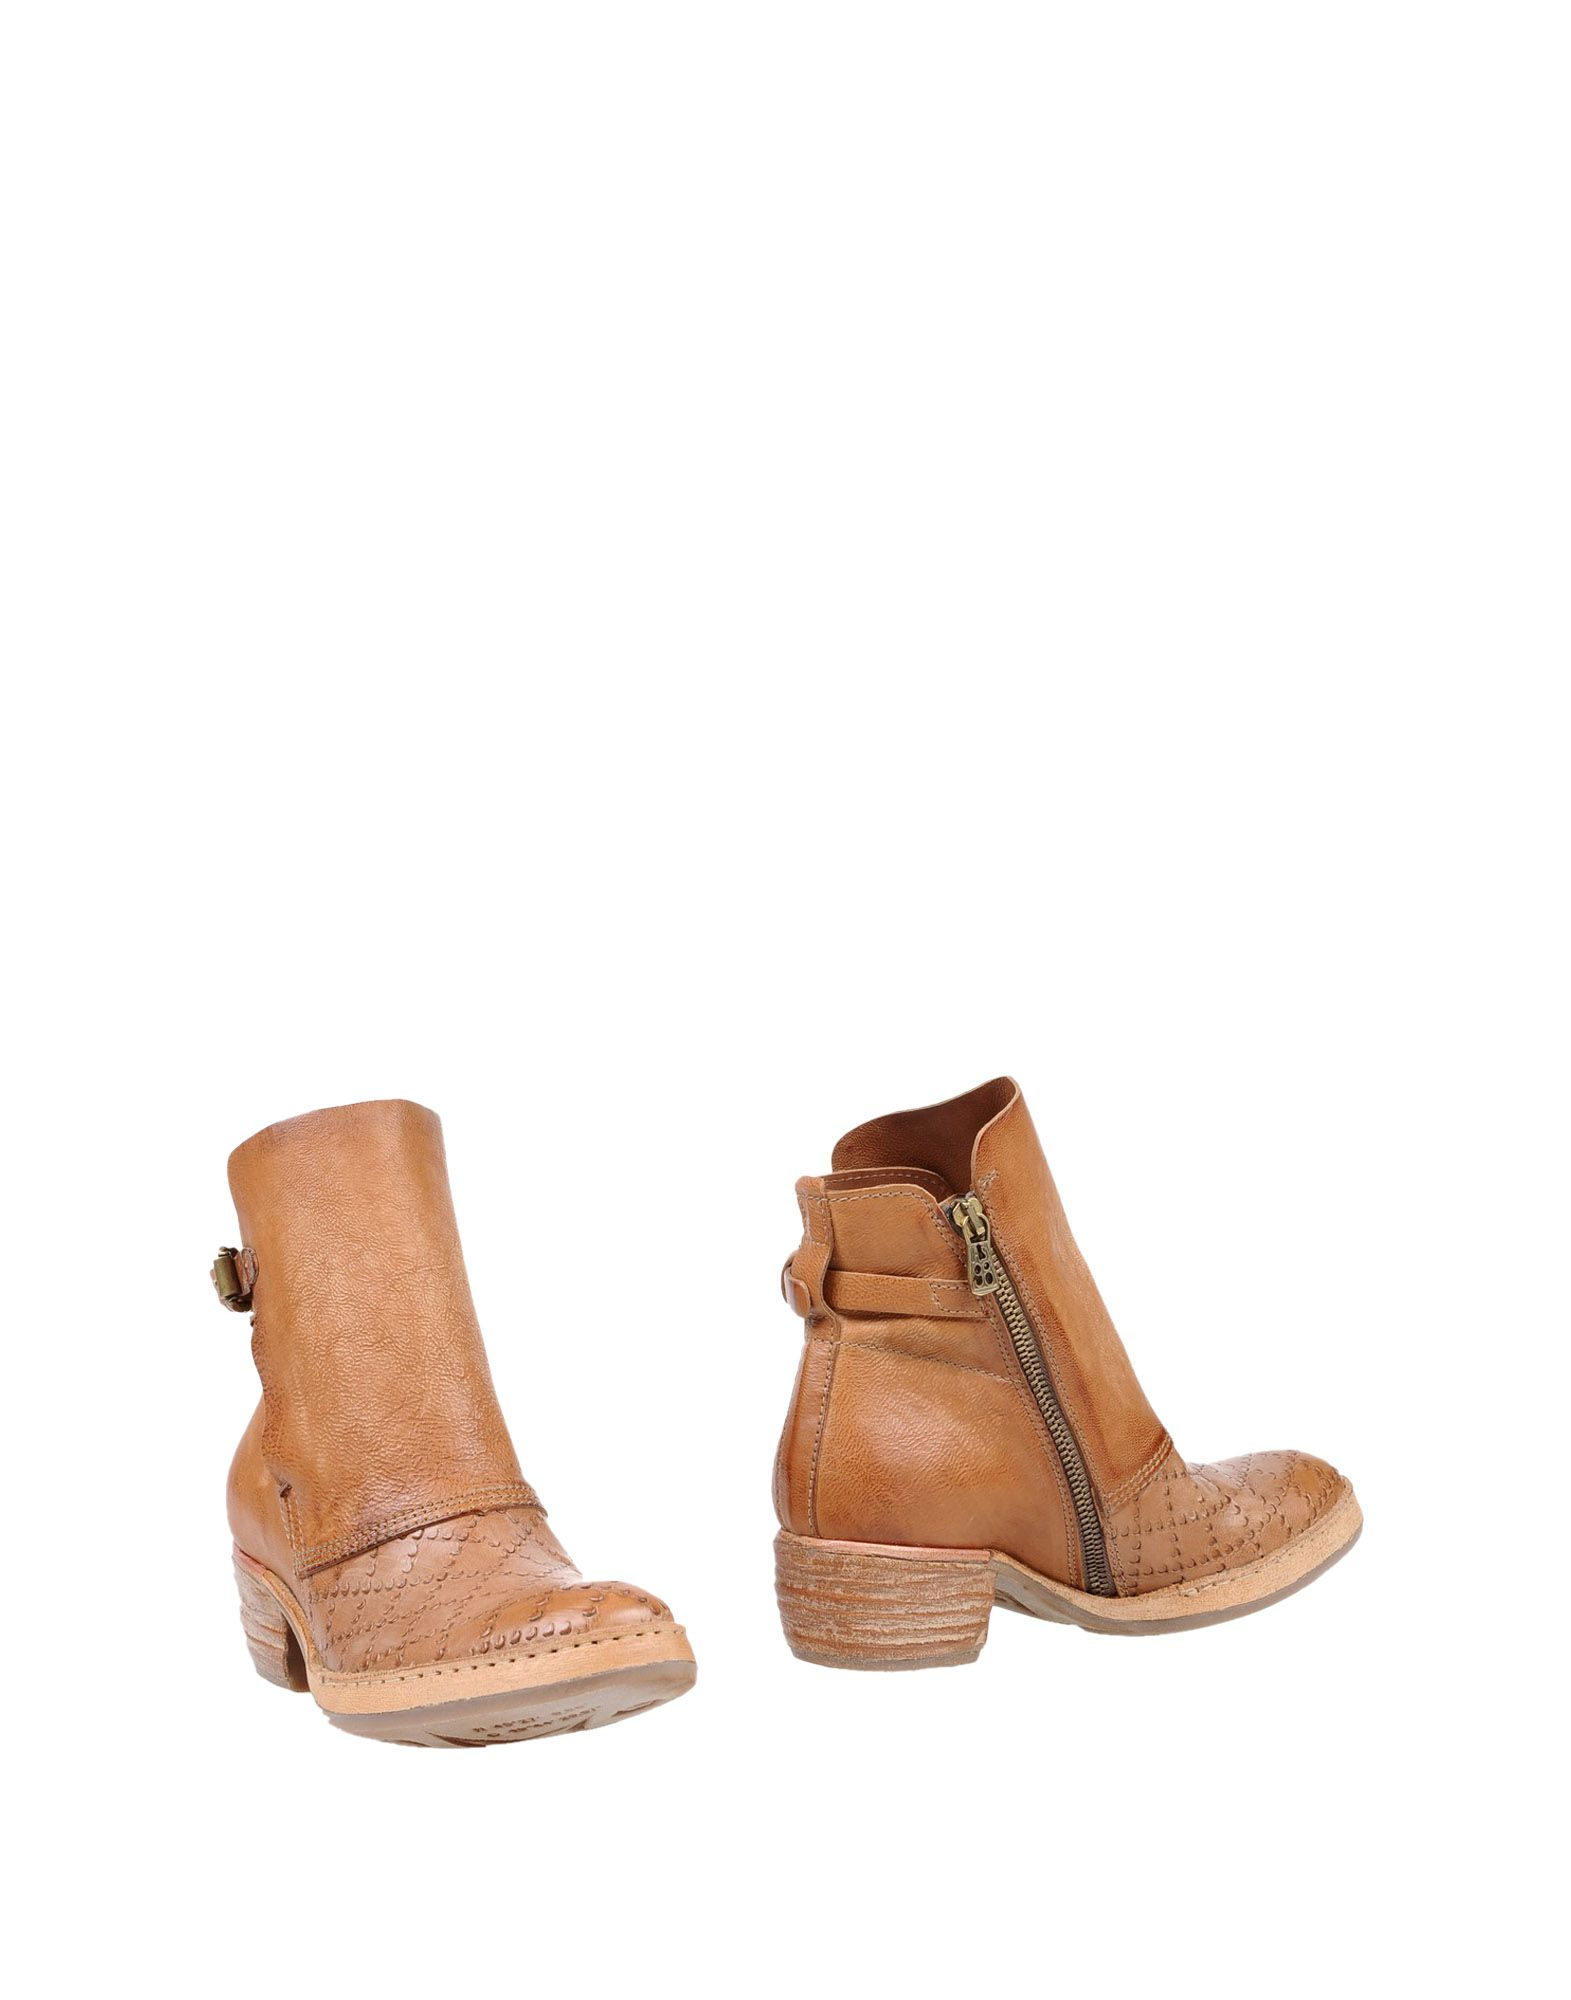 A.S. 98 Stiefelette Damen  11383828IU Gute Qualität beliebte Schuhe